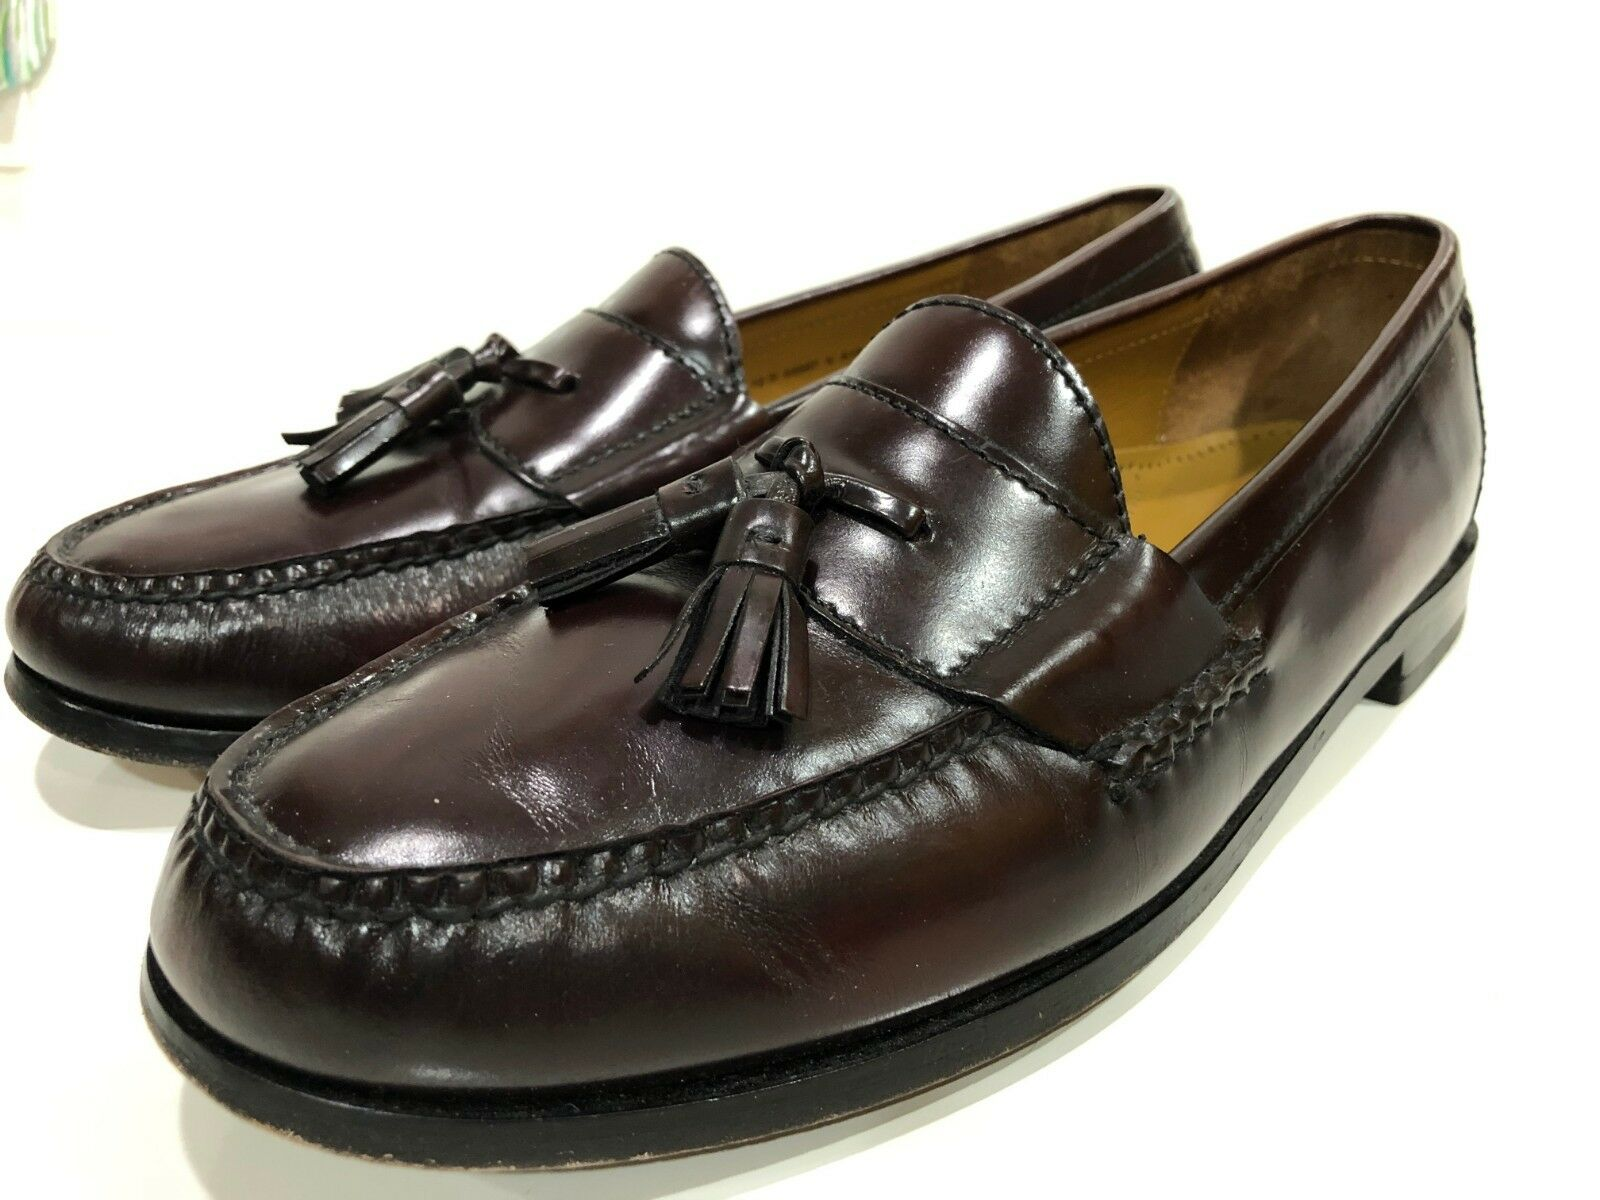 Cole Haan Men's Pinch Tassel Loafer Burgundy shoes Size 12 D